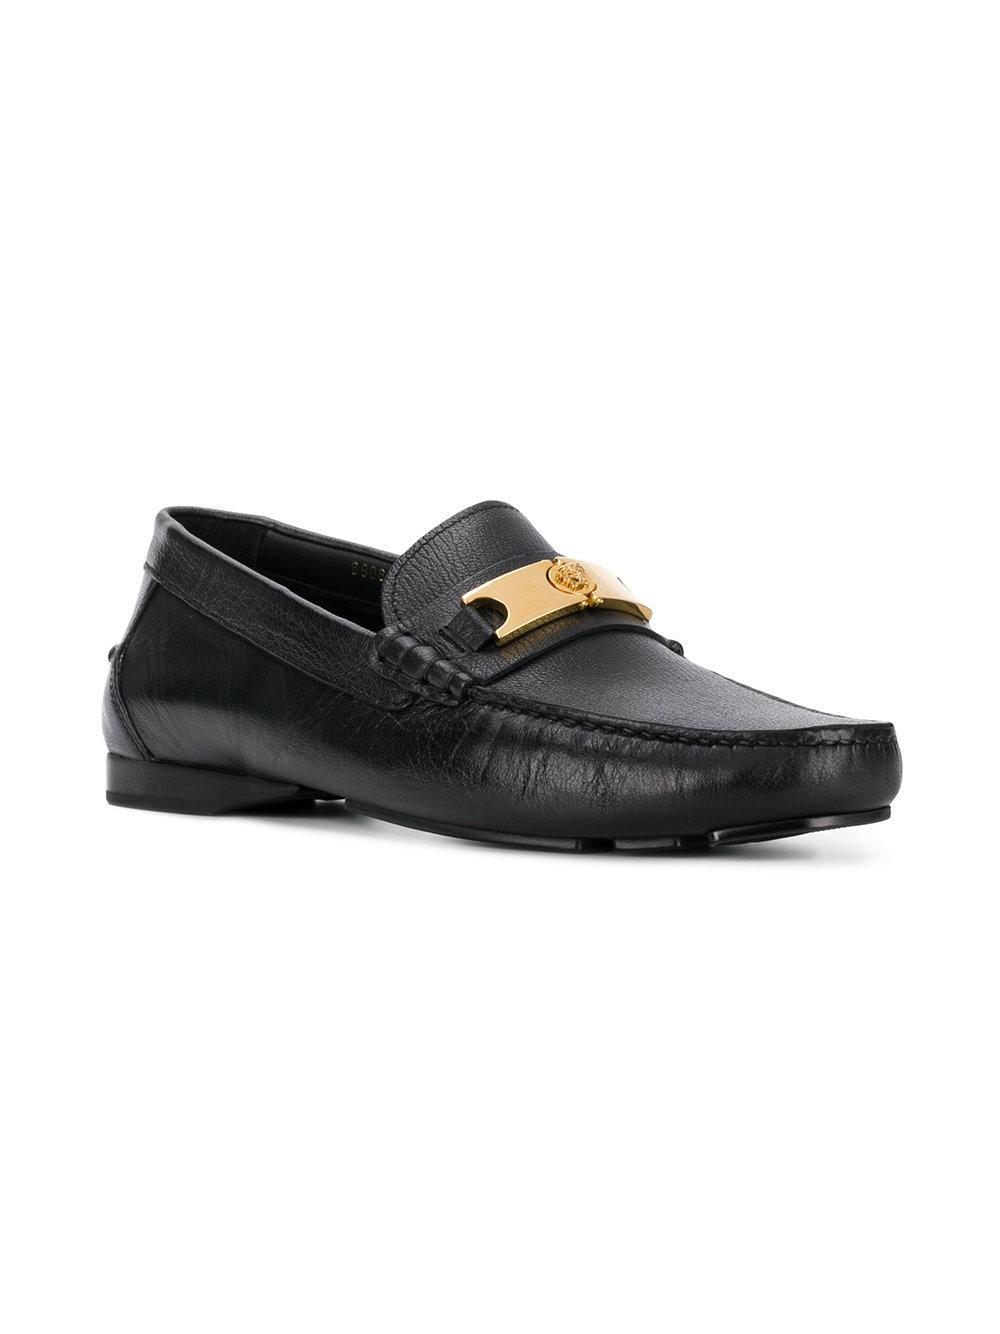 2b7bb149ddd Lyst - Versace Medusa Head Loafers in Black for Men